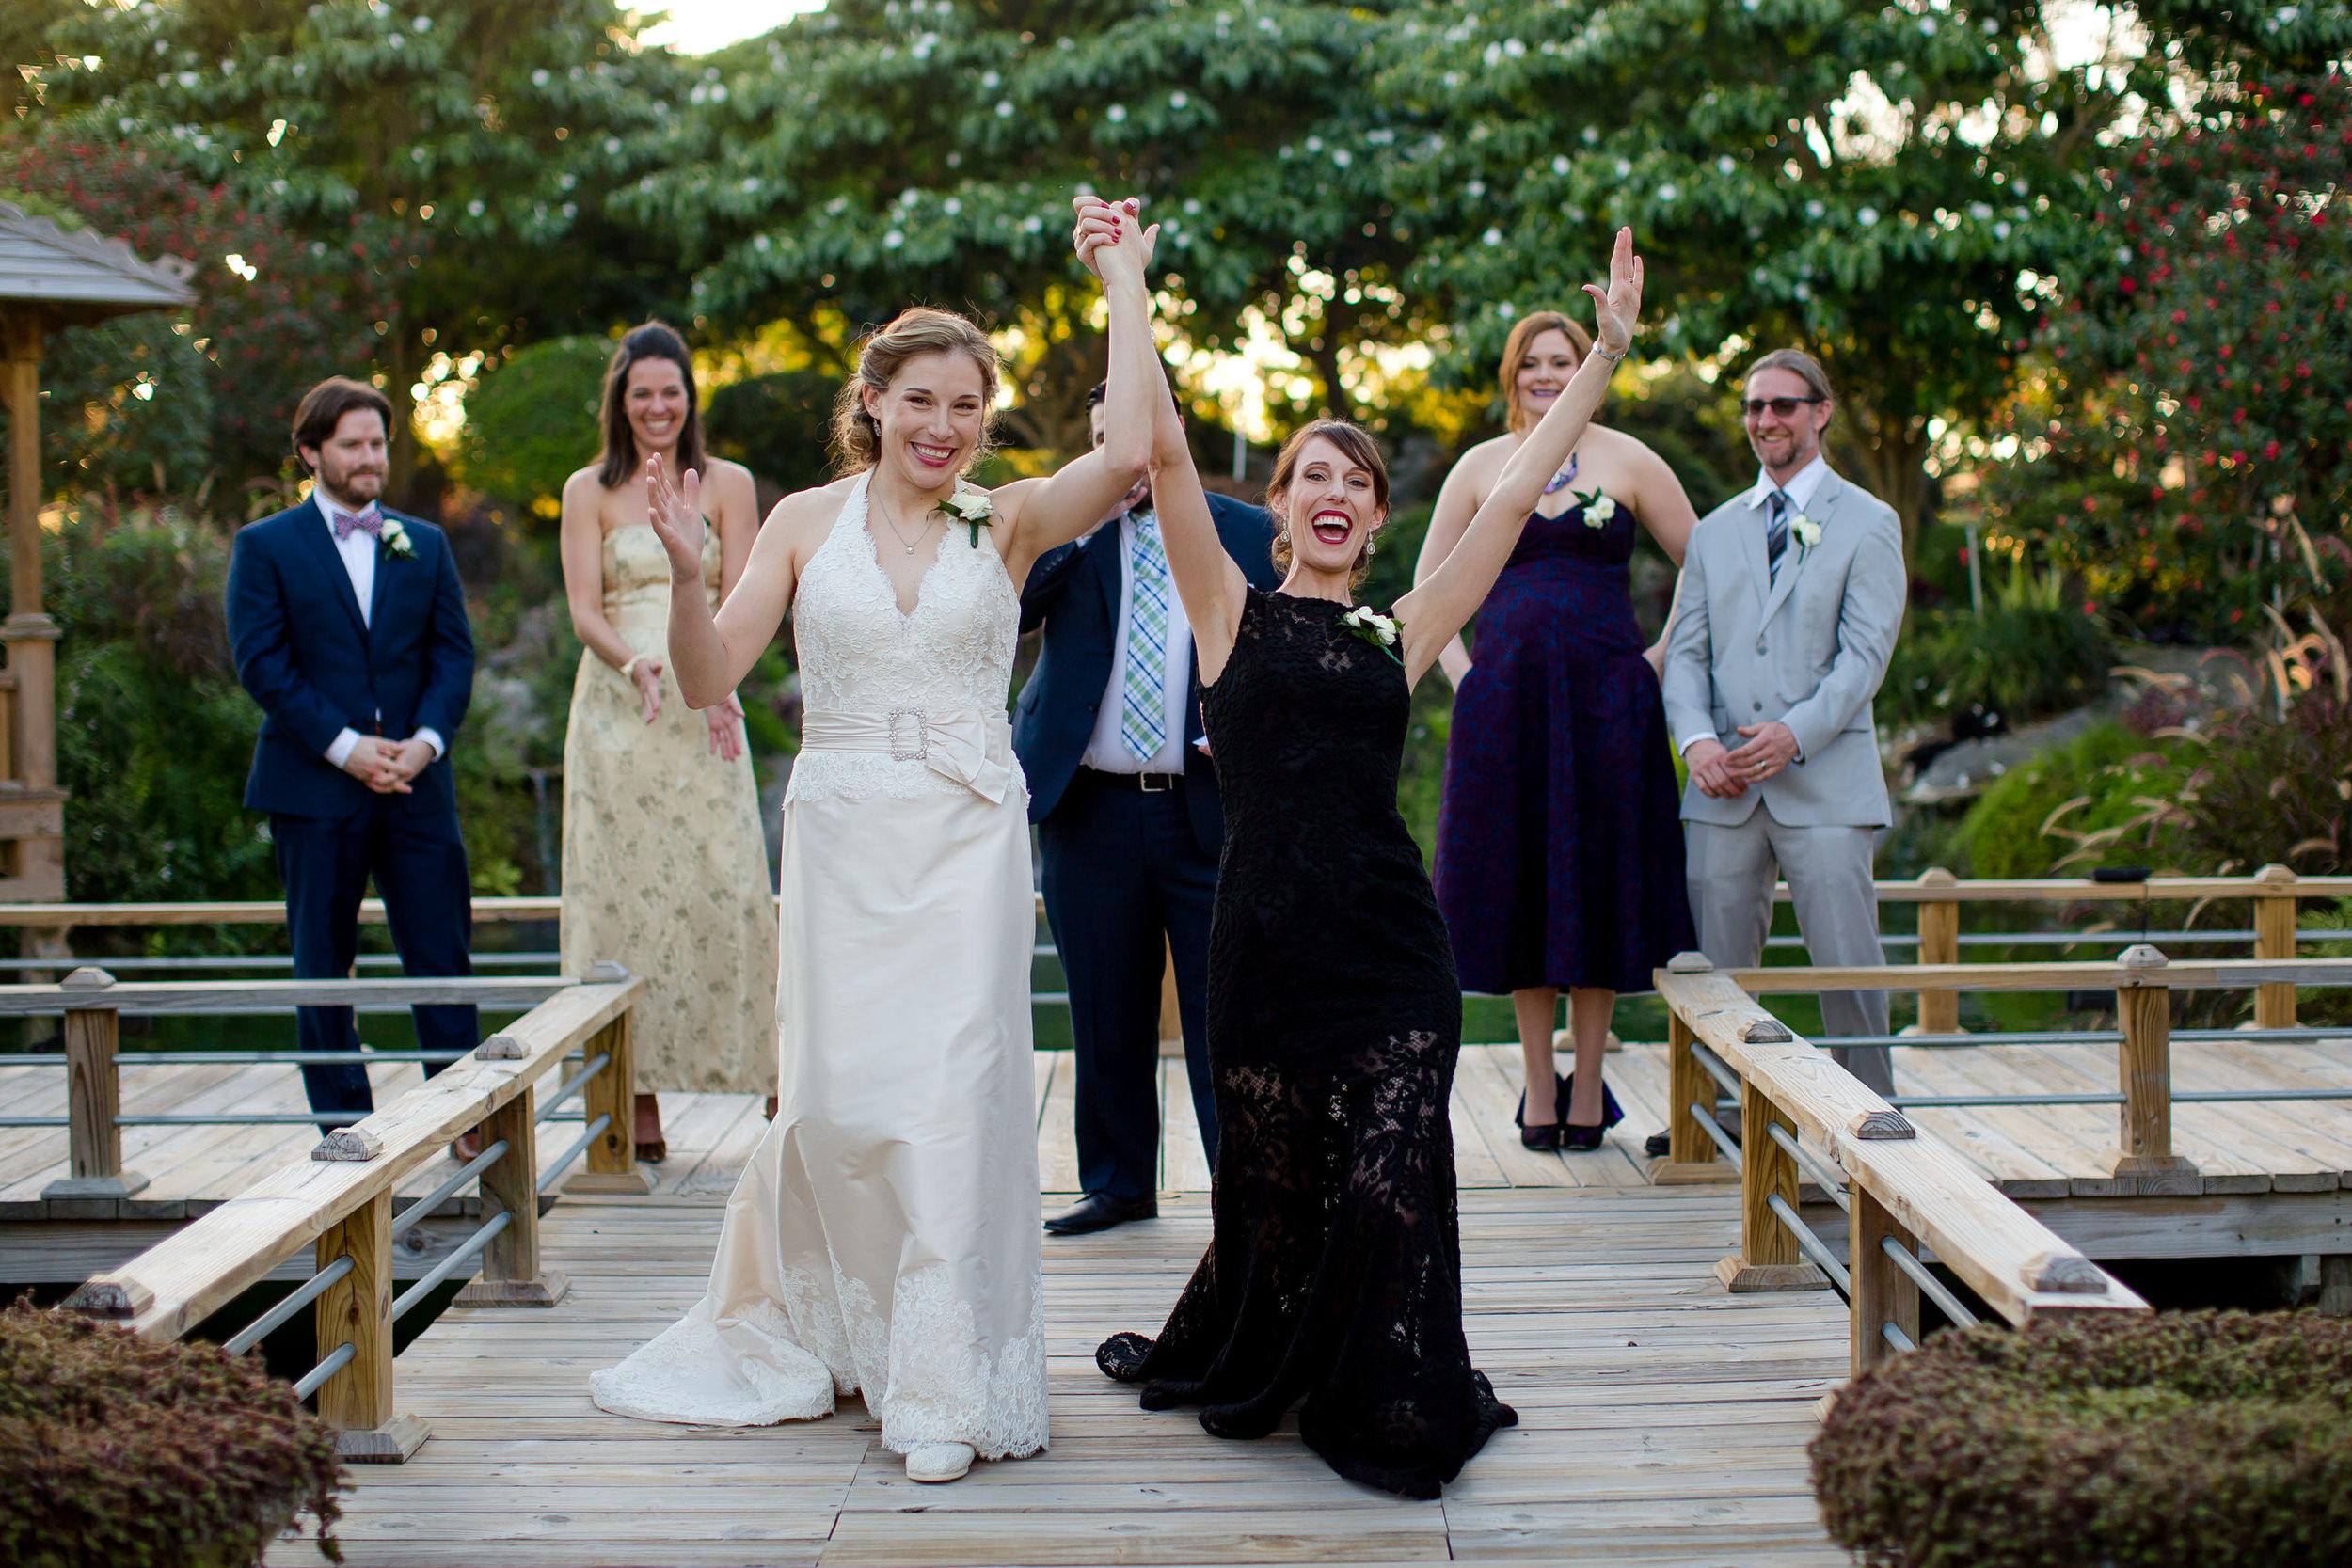 lgbtq-wedding-photographer-homestead-flroida-farm-weddings-tiny-house-photo.jpg